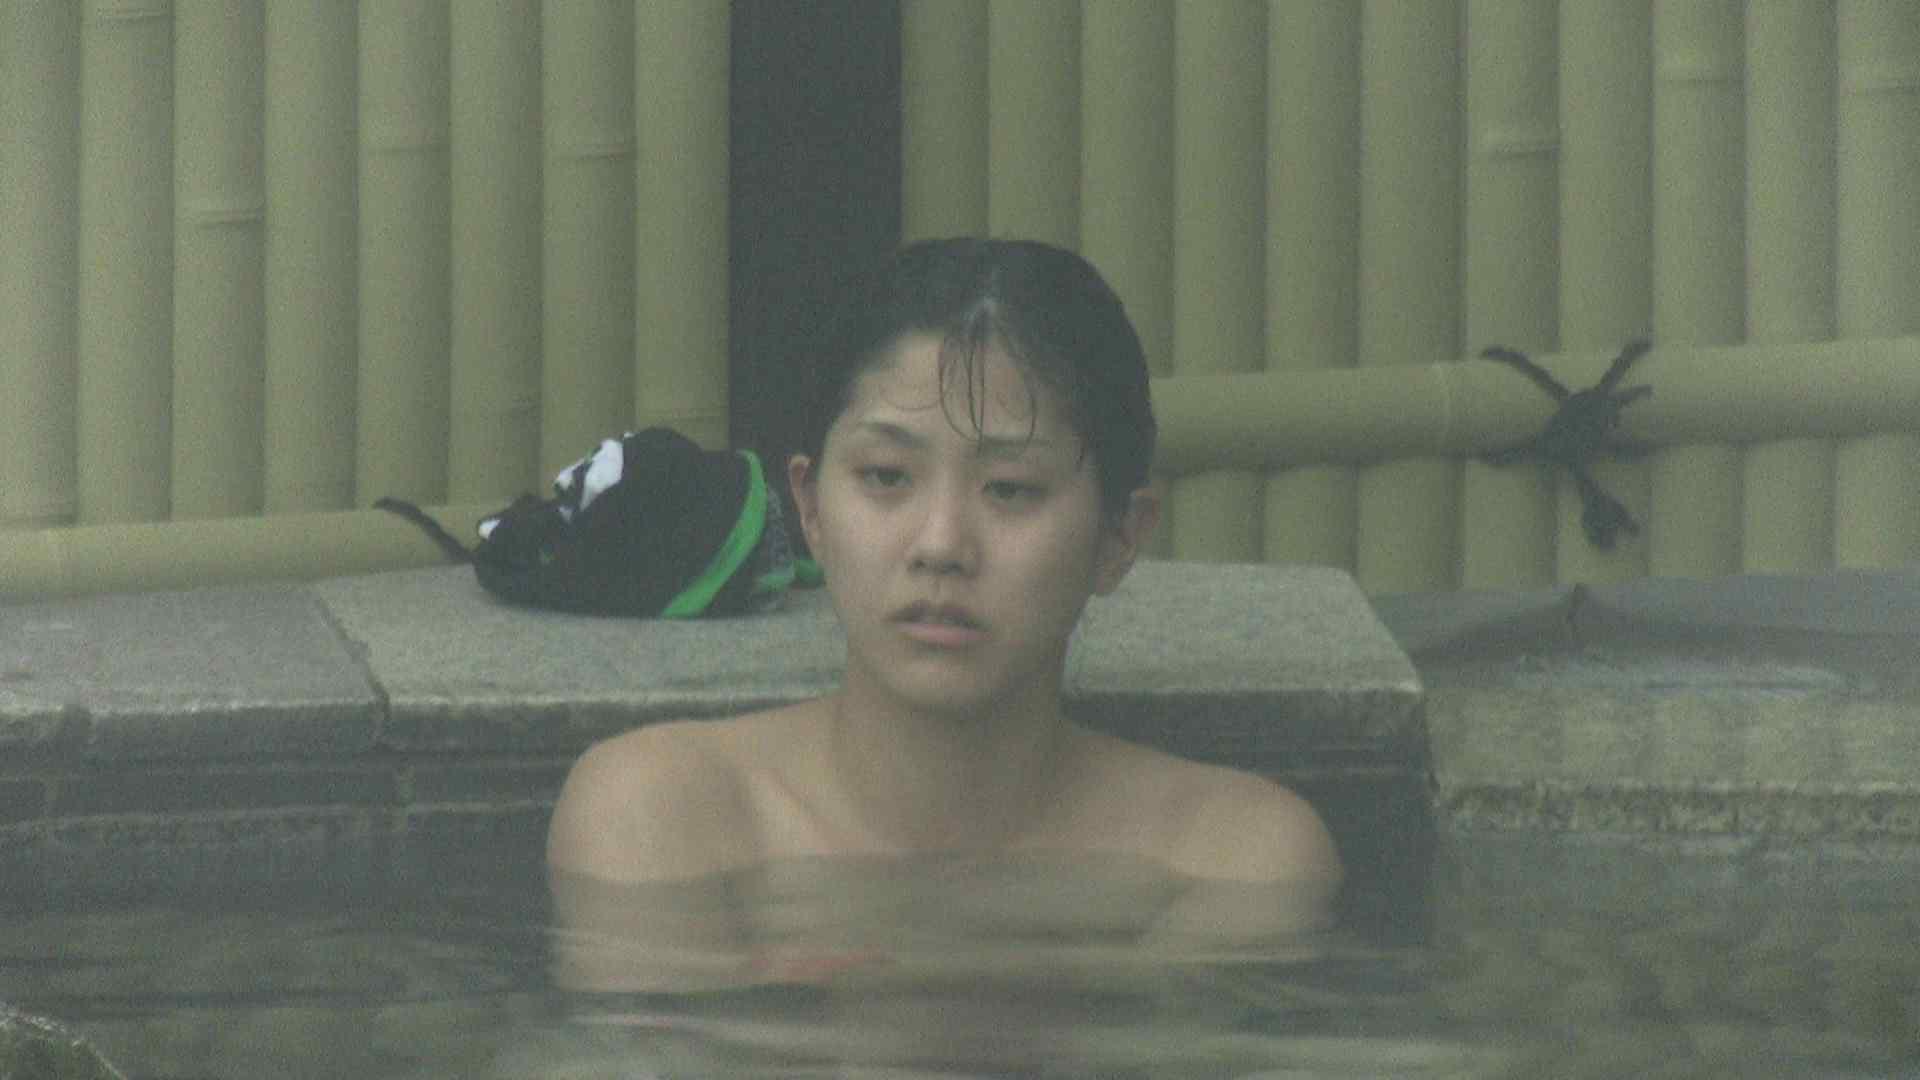 Aquaな露天風呂Vol.174 盗撮シリーズ | 露天風呂編  86PIX 59